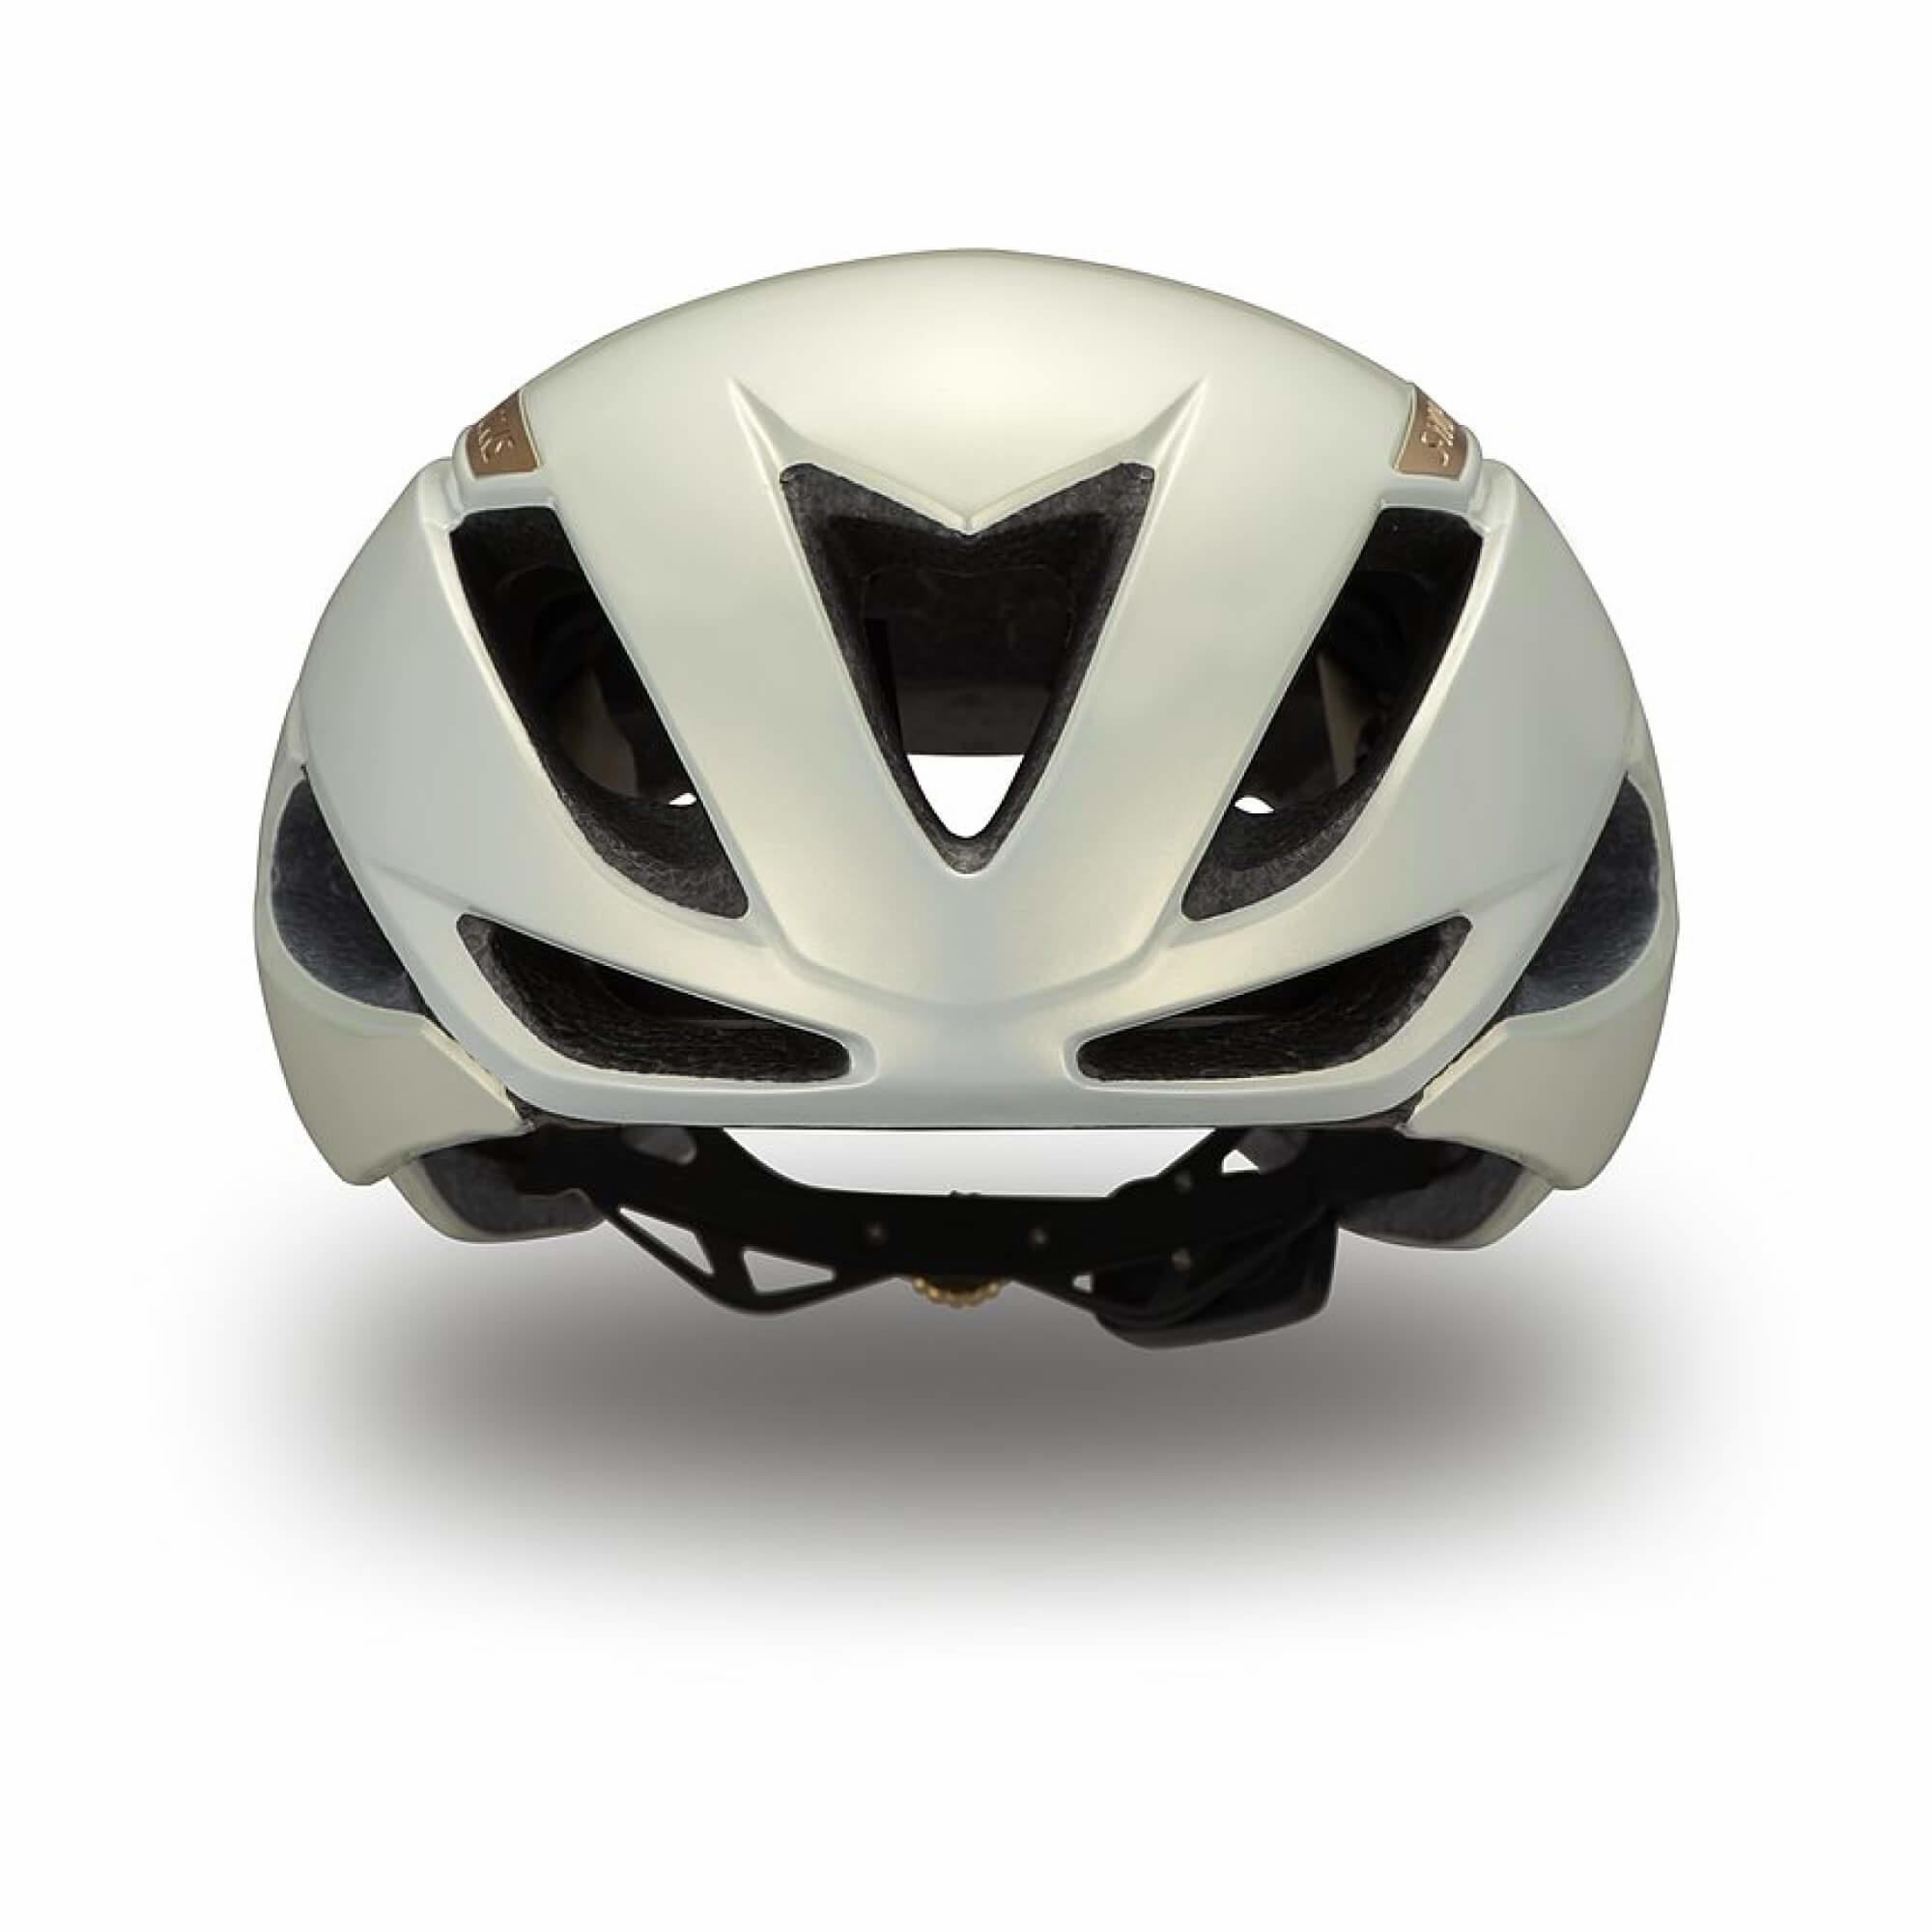 S-Works Evade II Helmet Angi Mips Sagan Disruption 2022-2